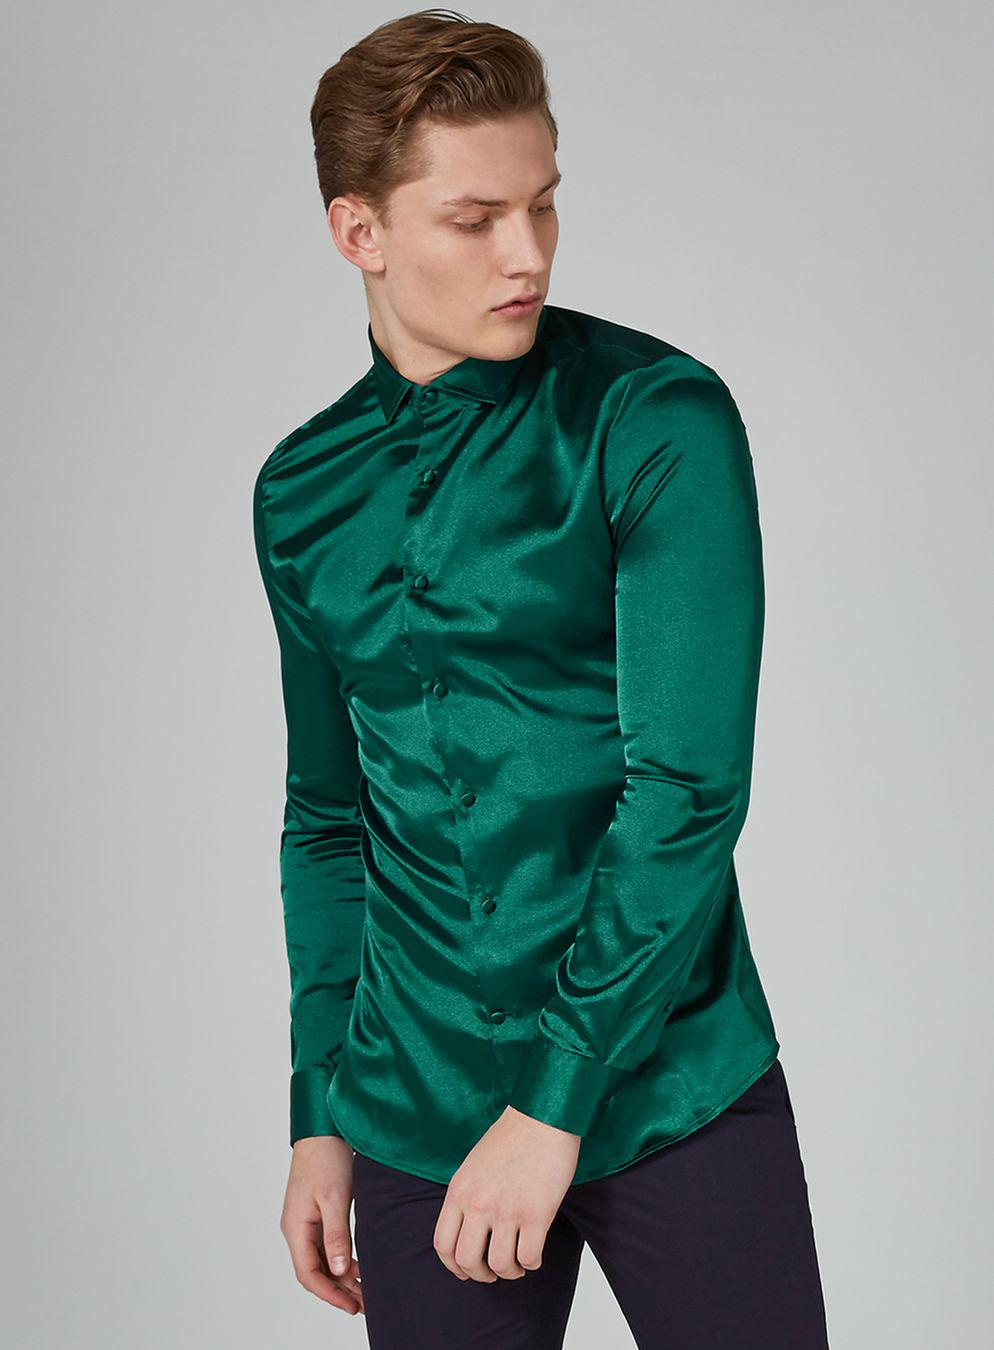 topman emerald green satin shirt for men